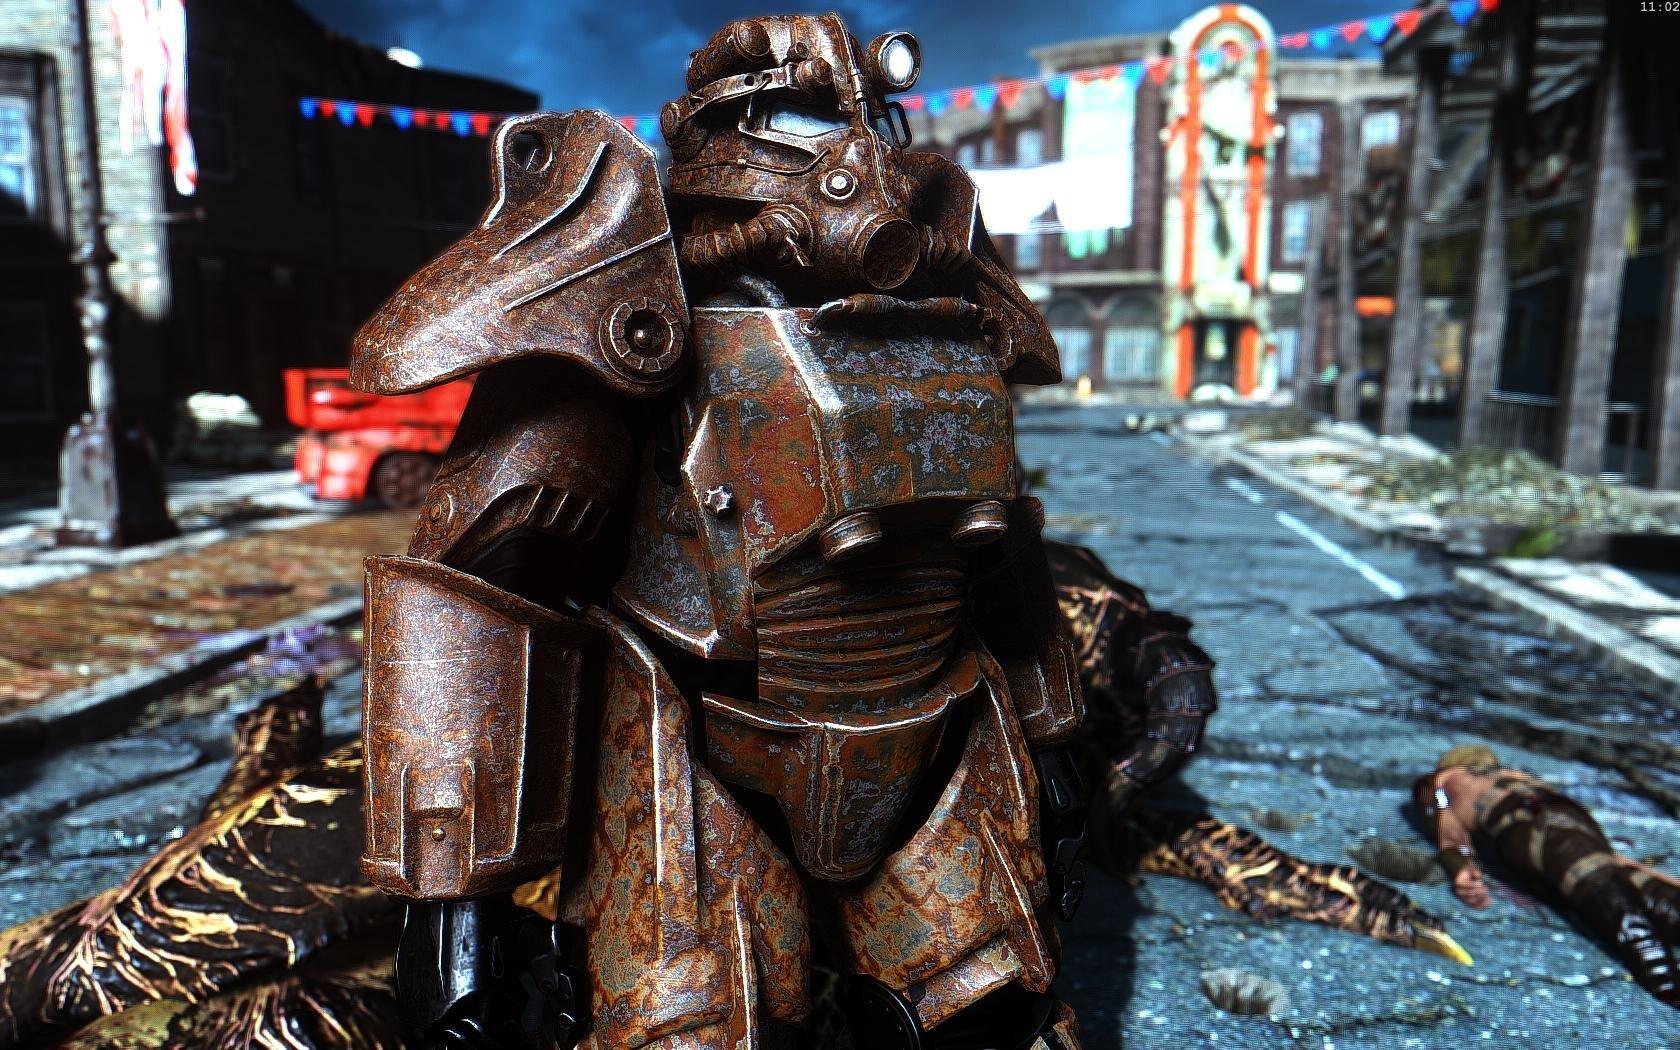 Fallout4 2018-12-27 11-02-27-88